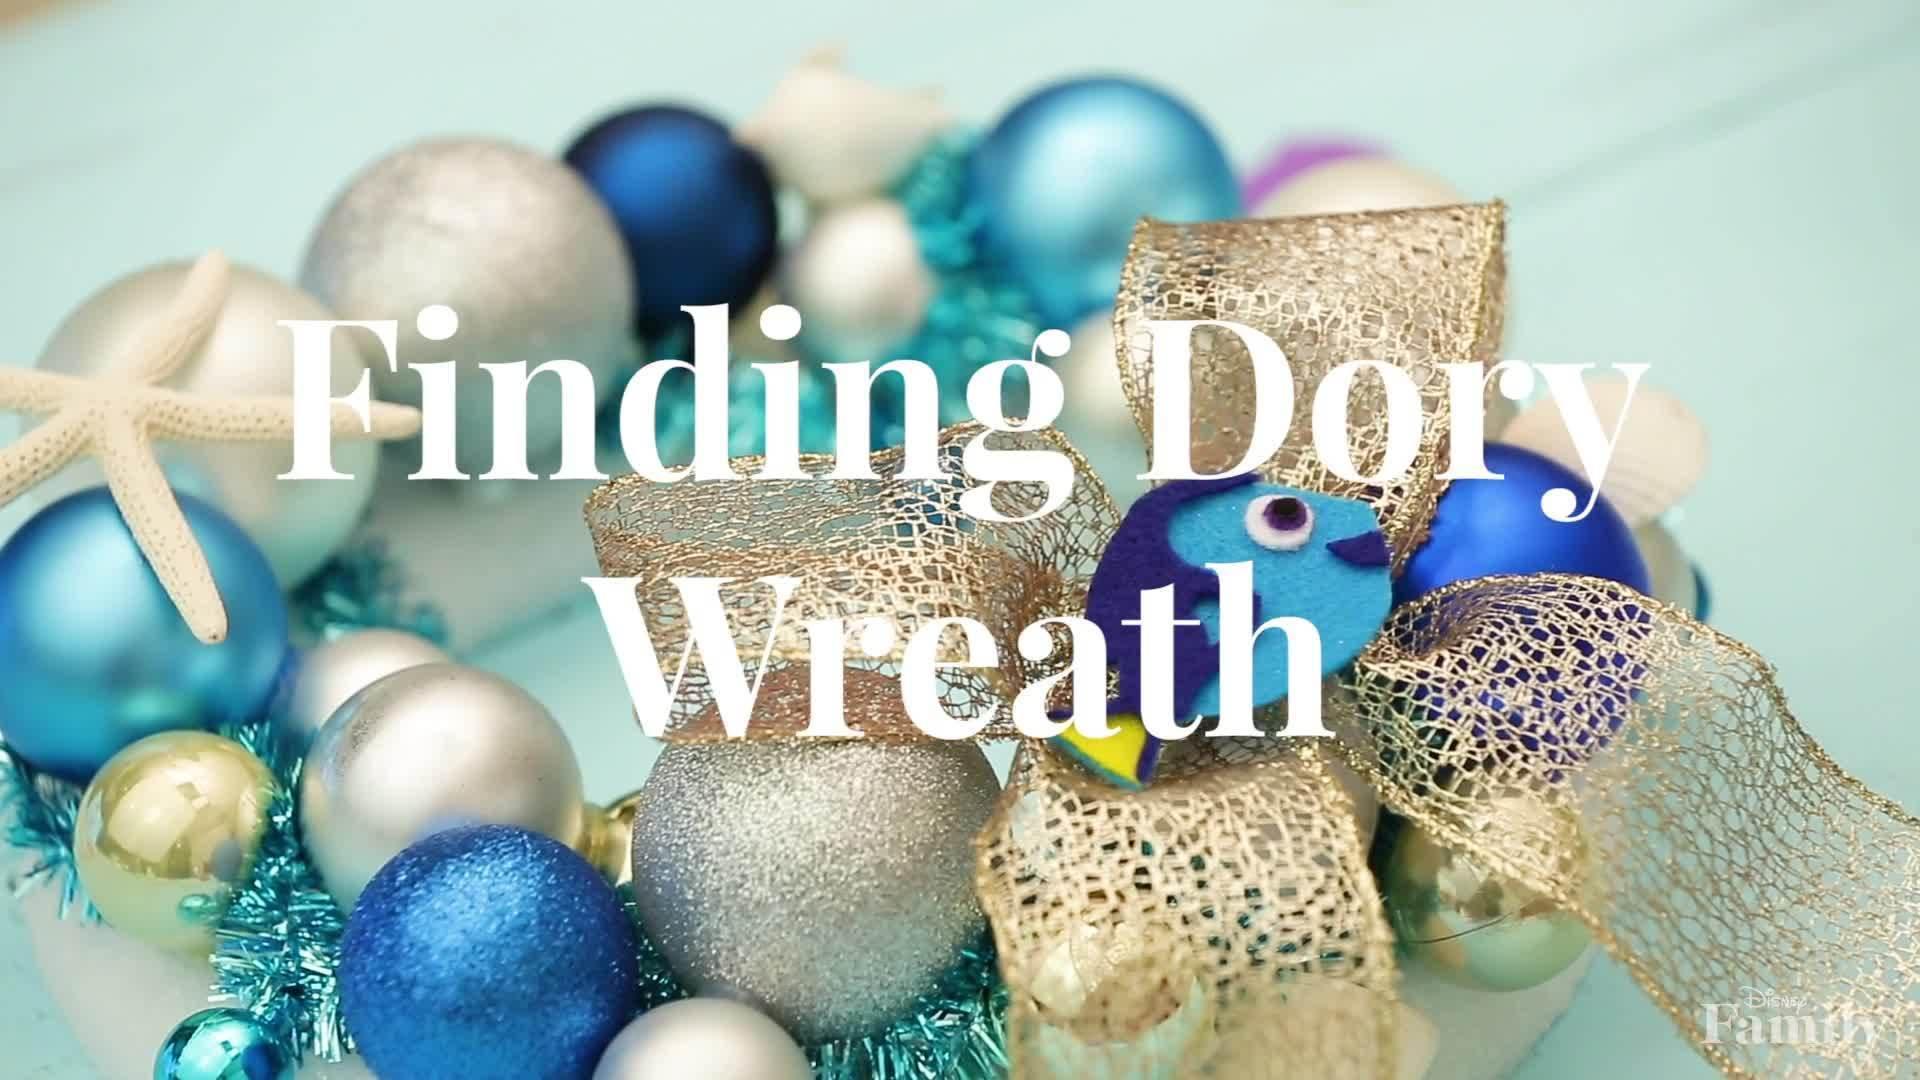 Disney Family: Finding Dory Holiday Wreath